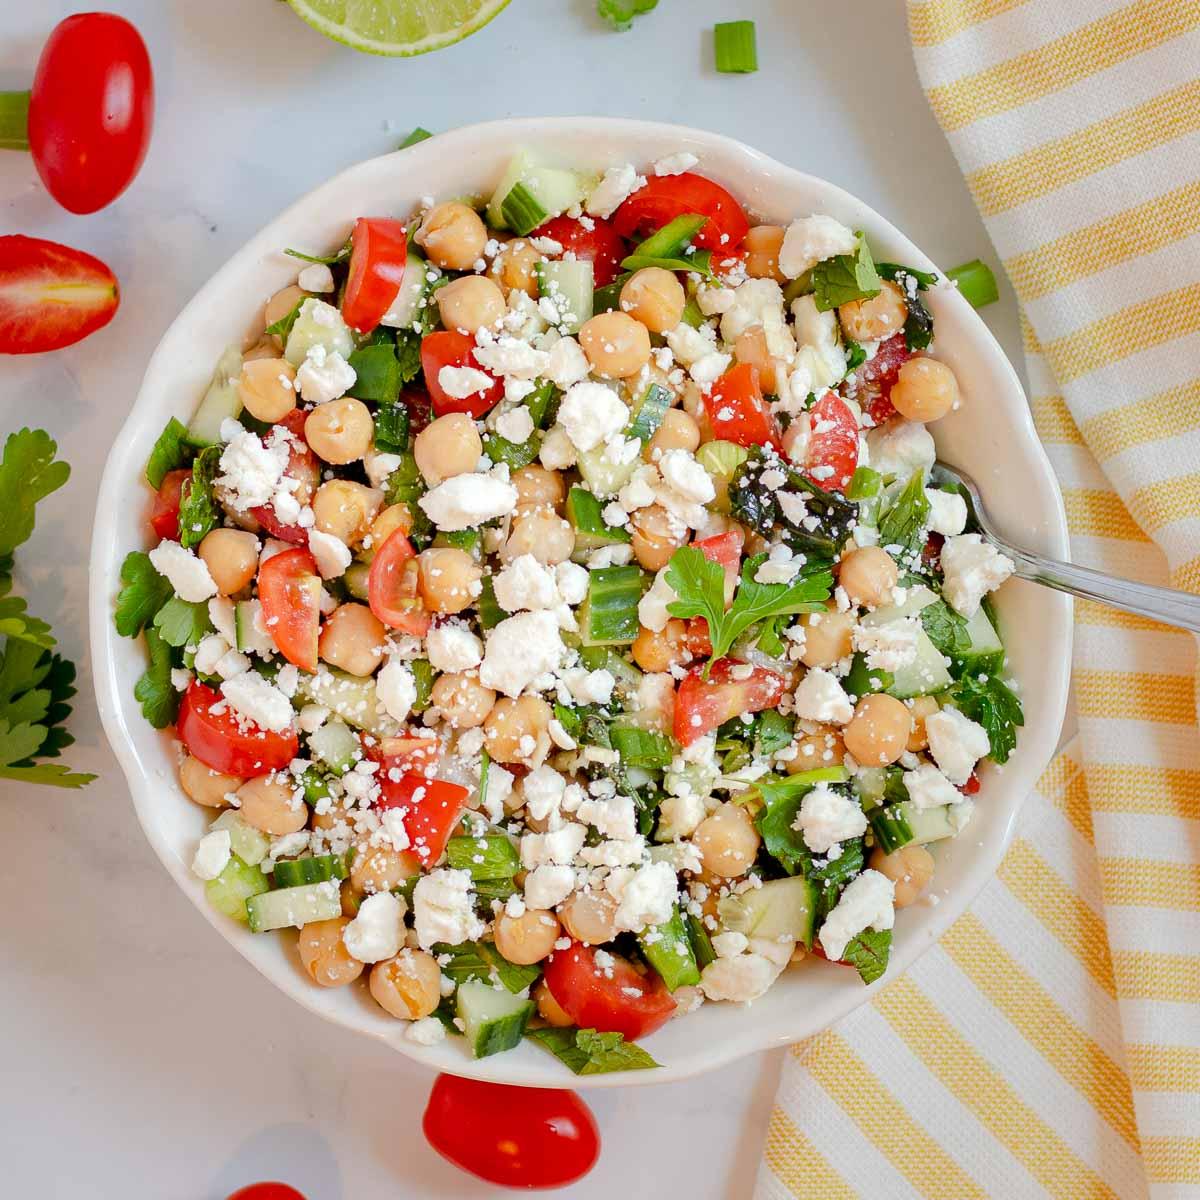 Chickpea feta salad in a bowl.